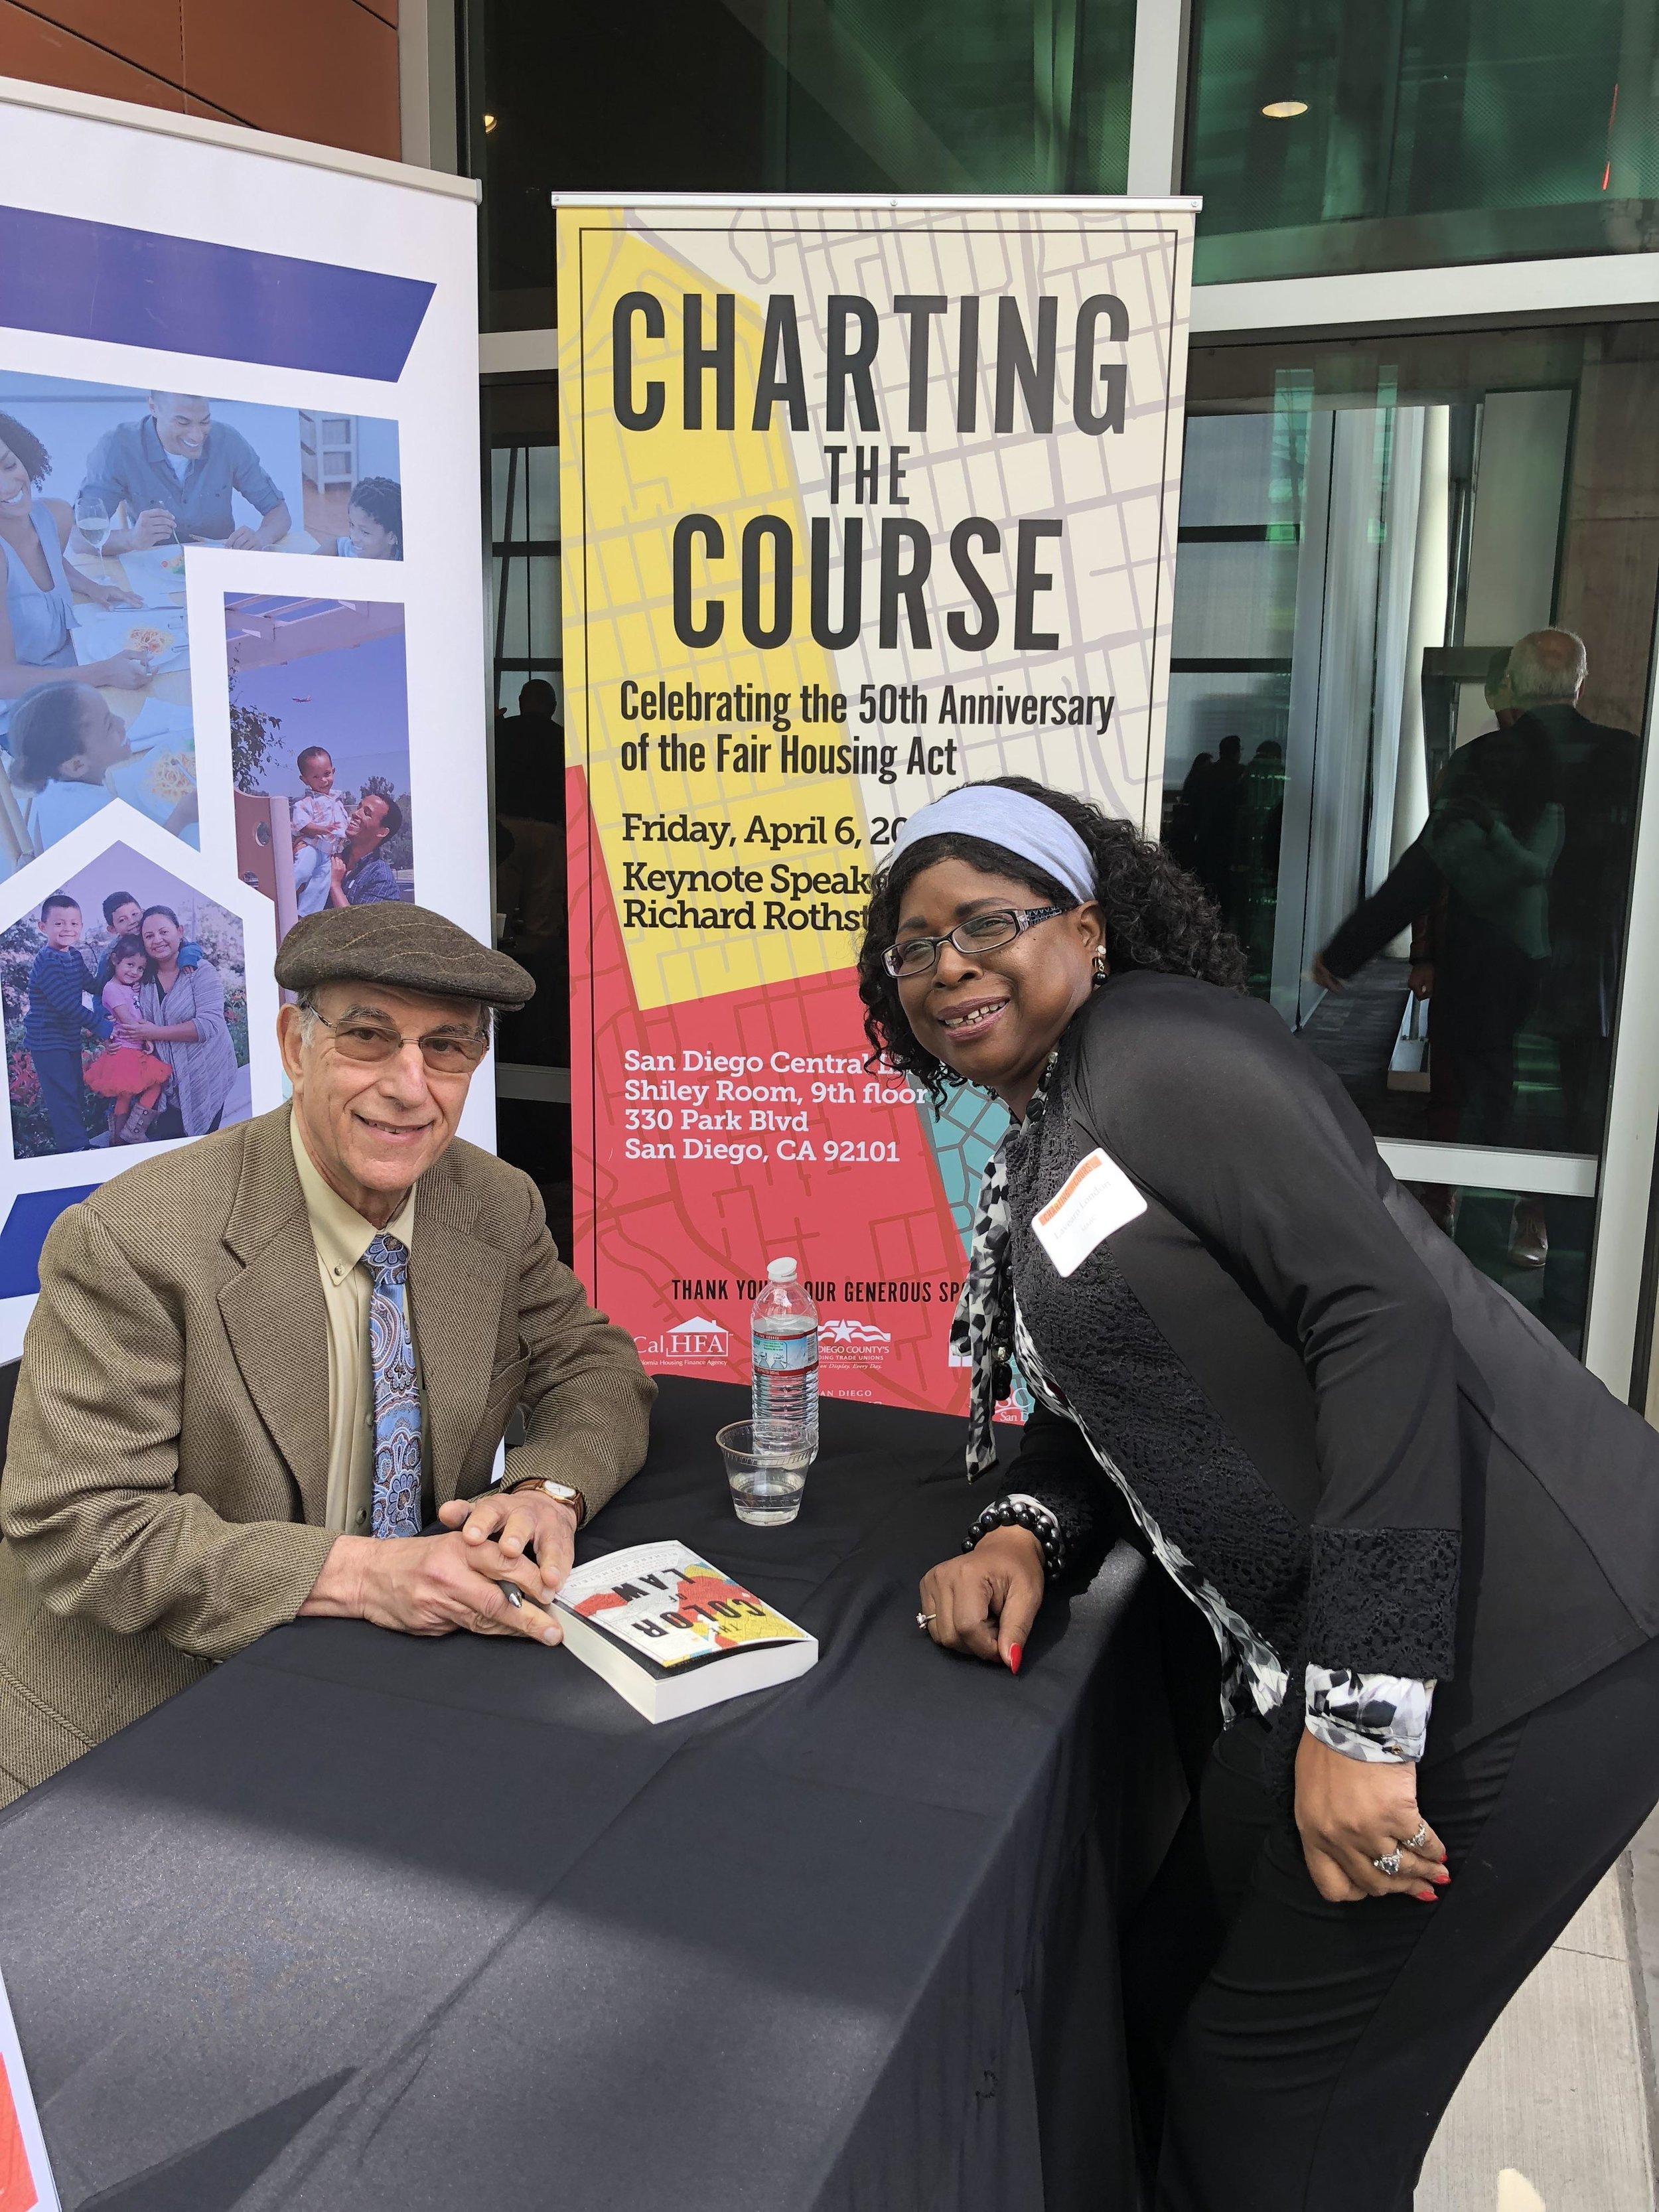 Lavearn London Meeting Author Richard Rothstein